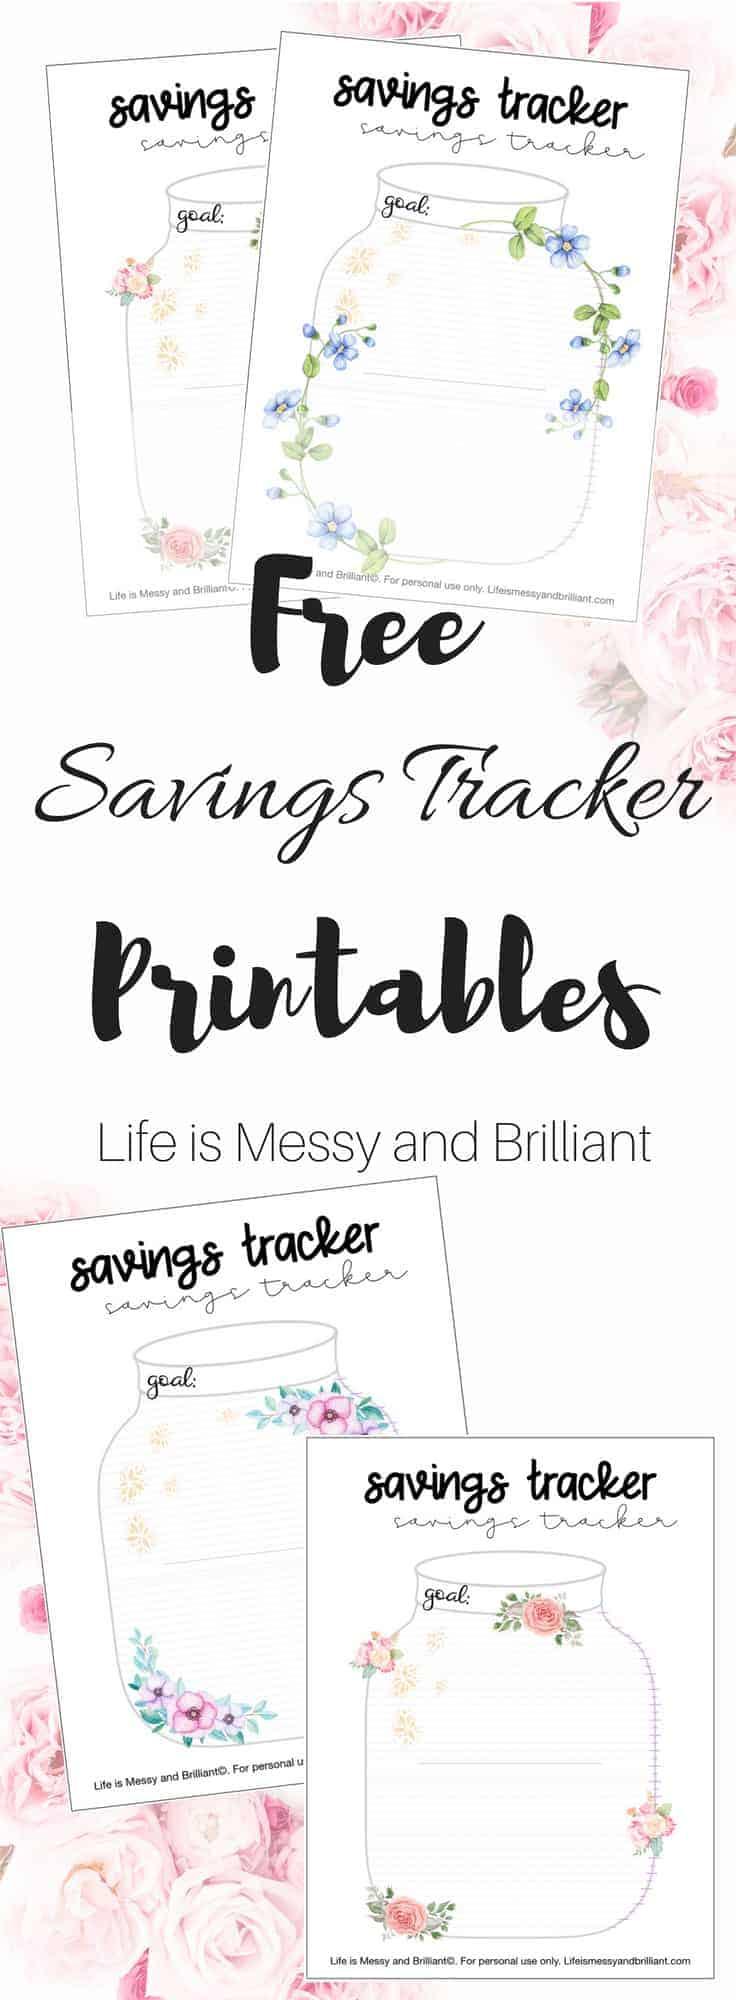 Free Savings Tracker Printable